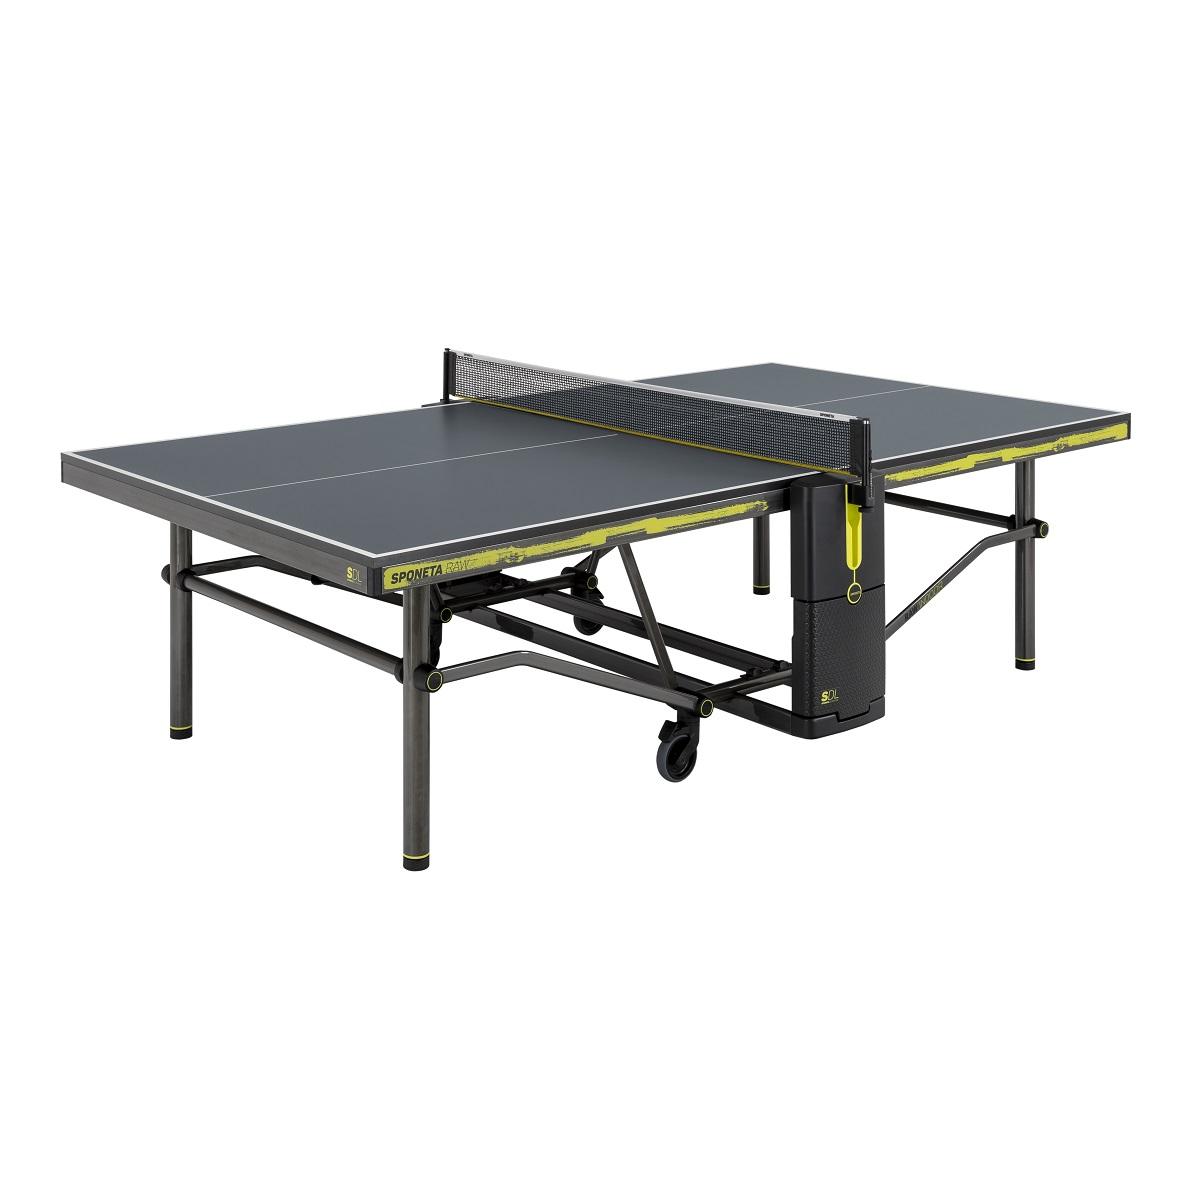 Stůl na stolní tenis SPONETA Design Line - Raw Outdoor - venkovní